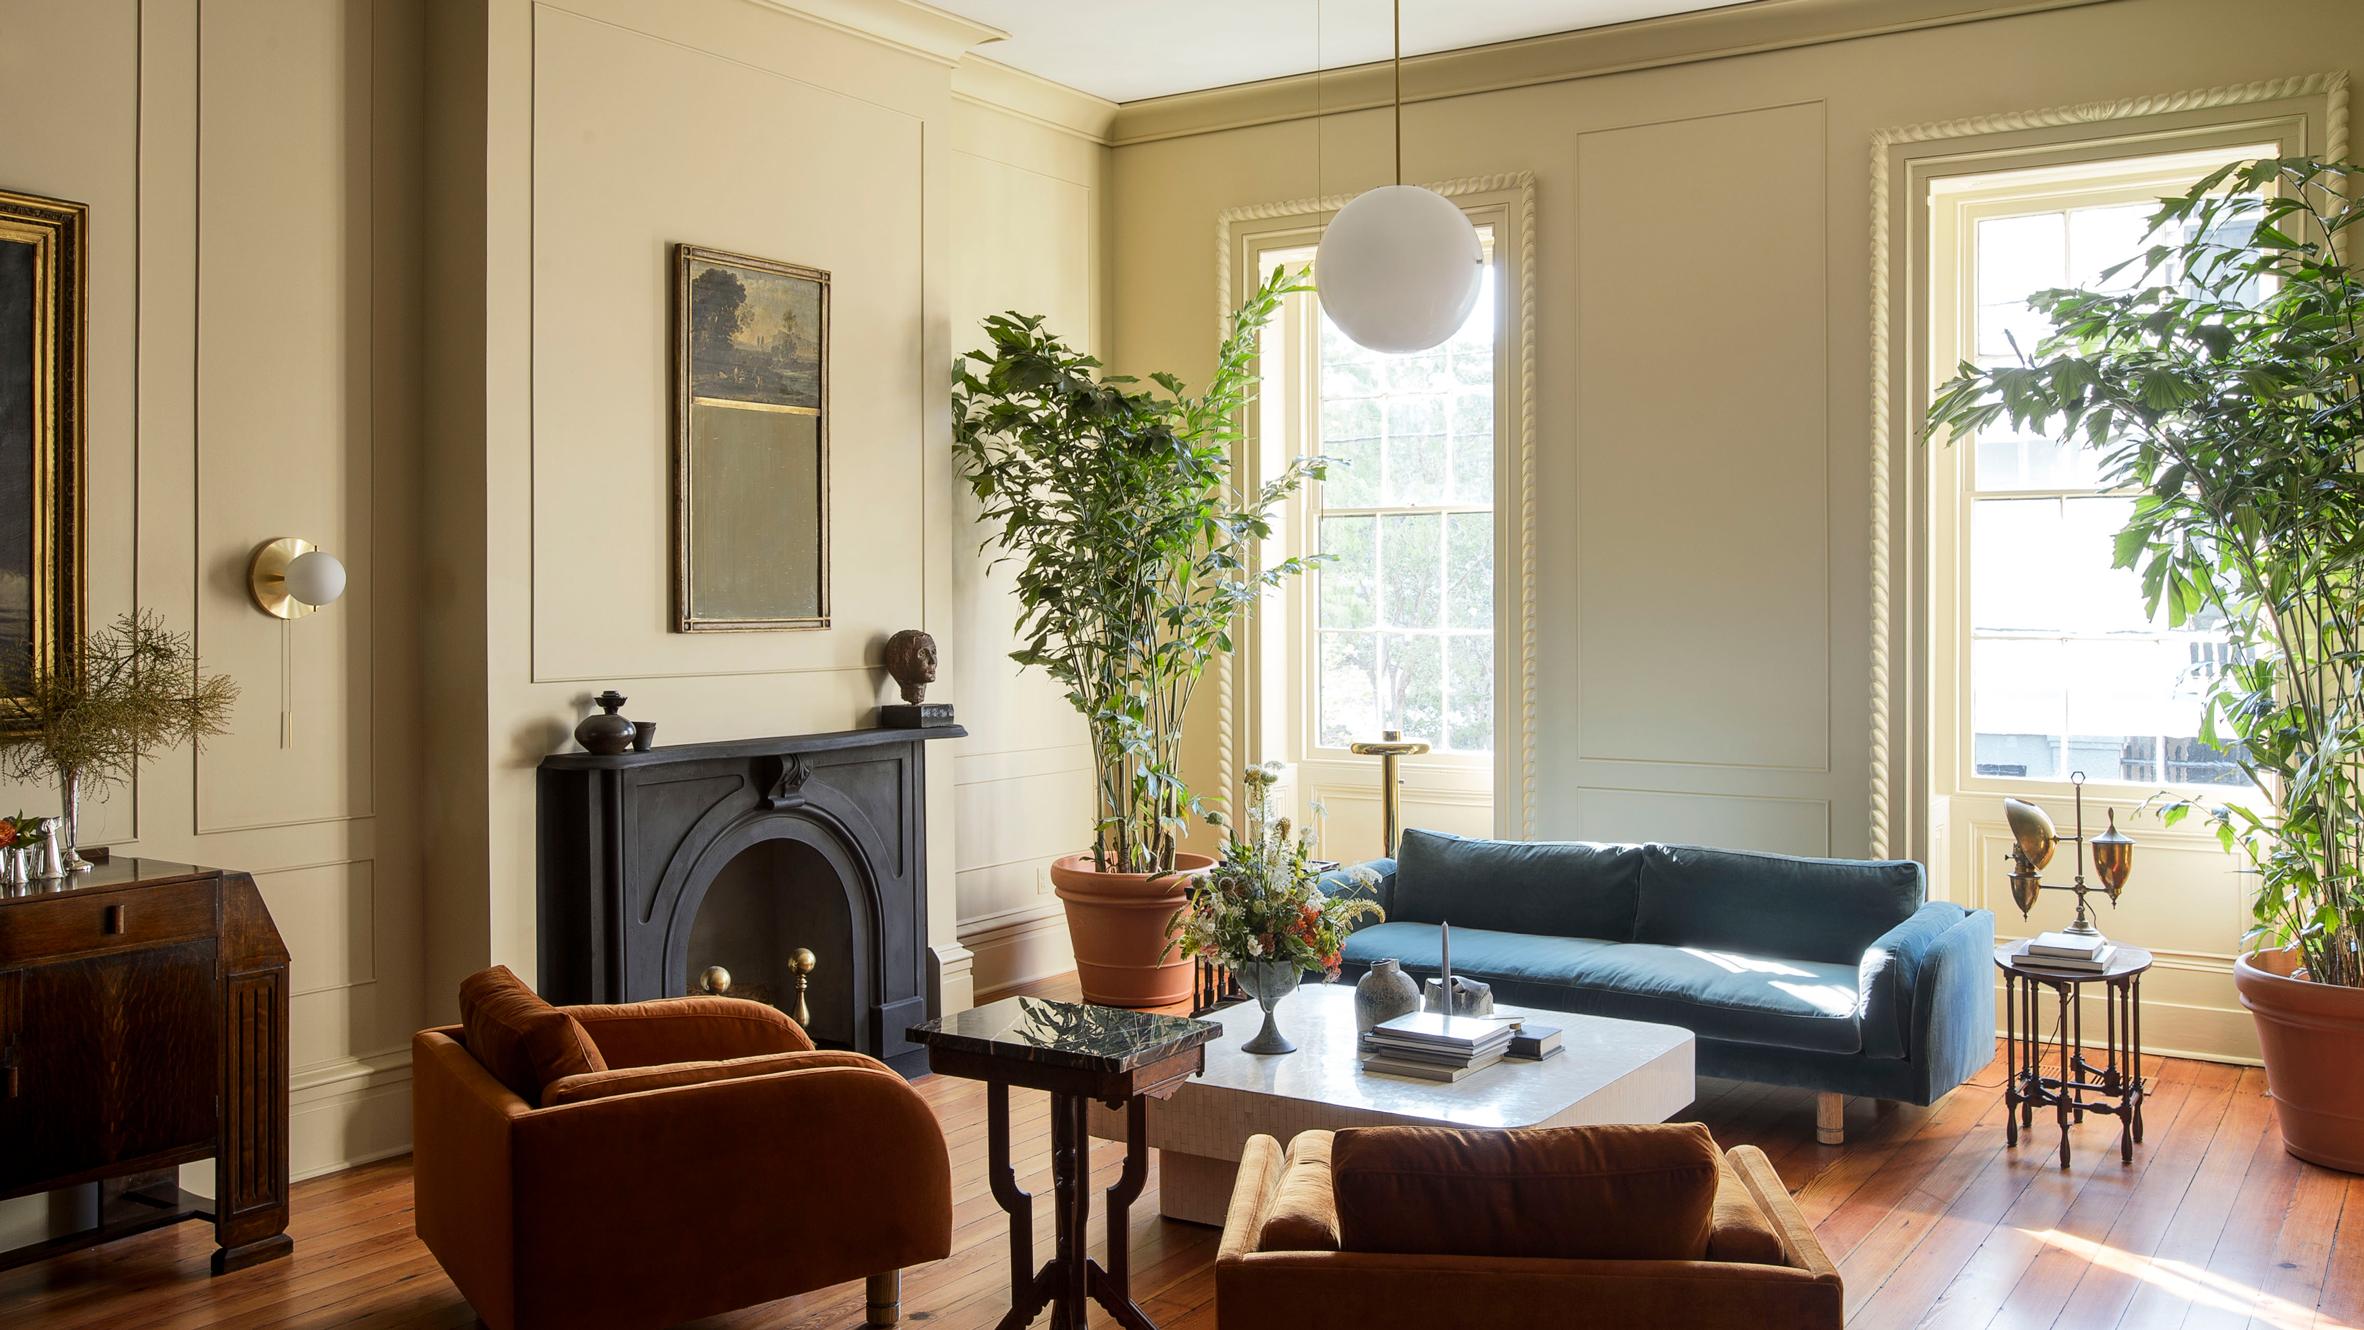 workstead-house-charleston-south-carolina-renovation-workstead_dezeen_hero.jpg